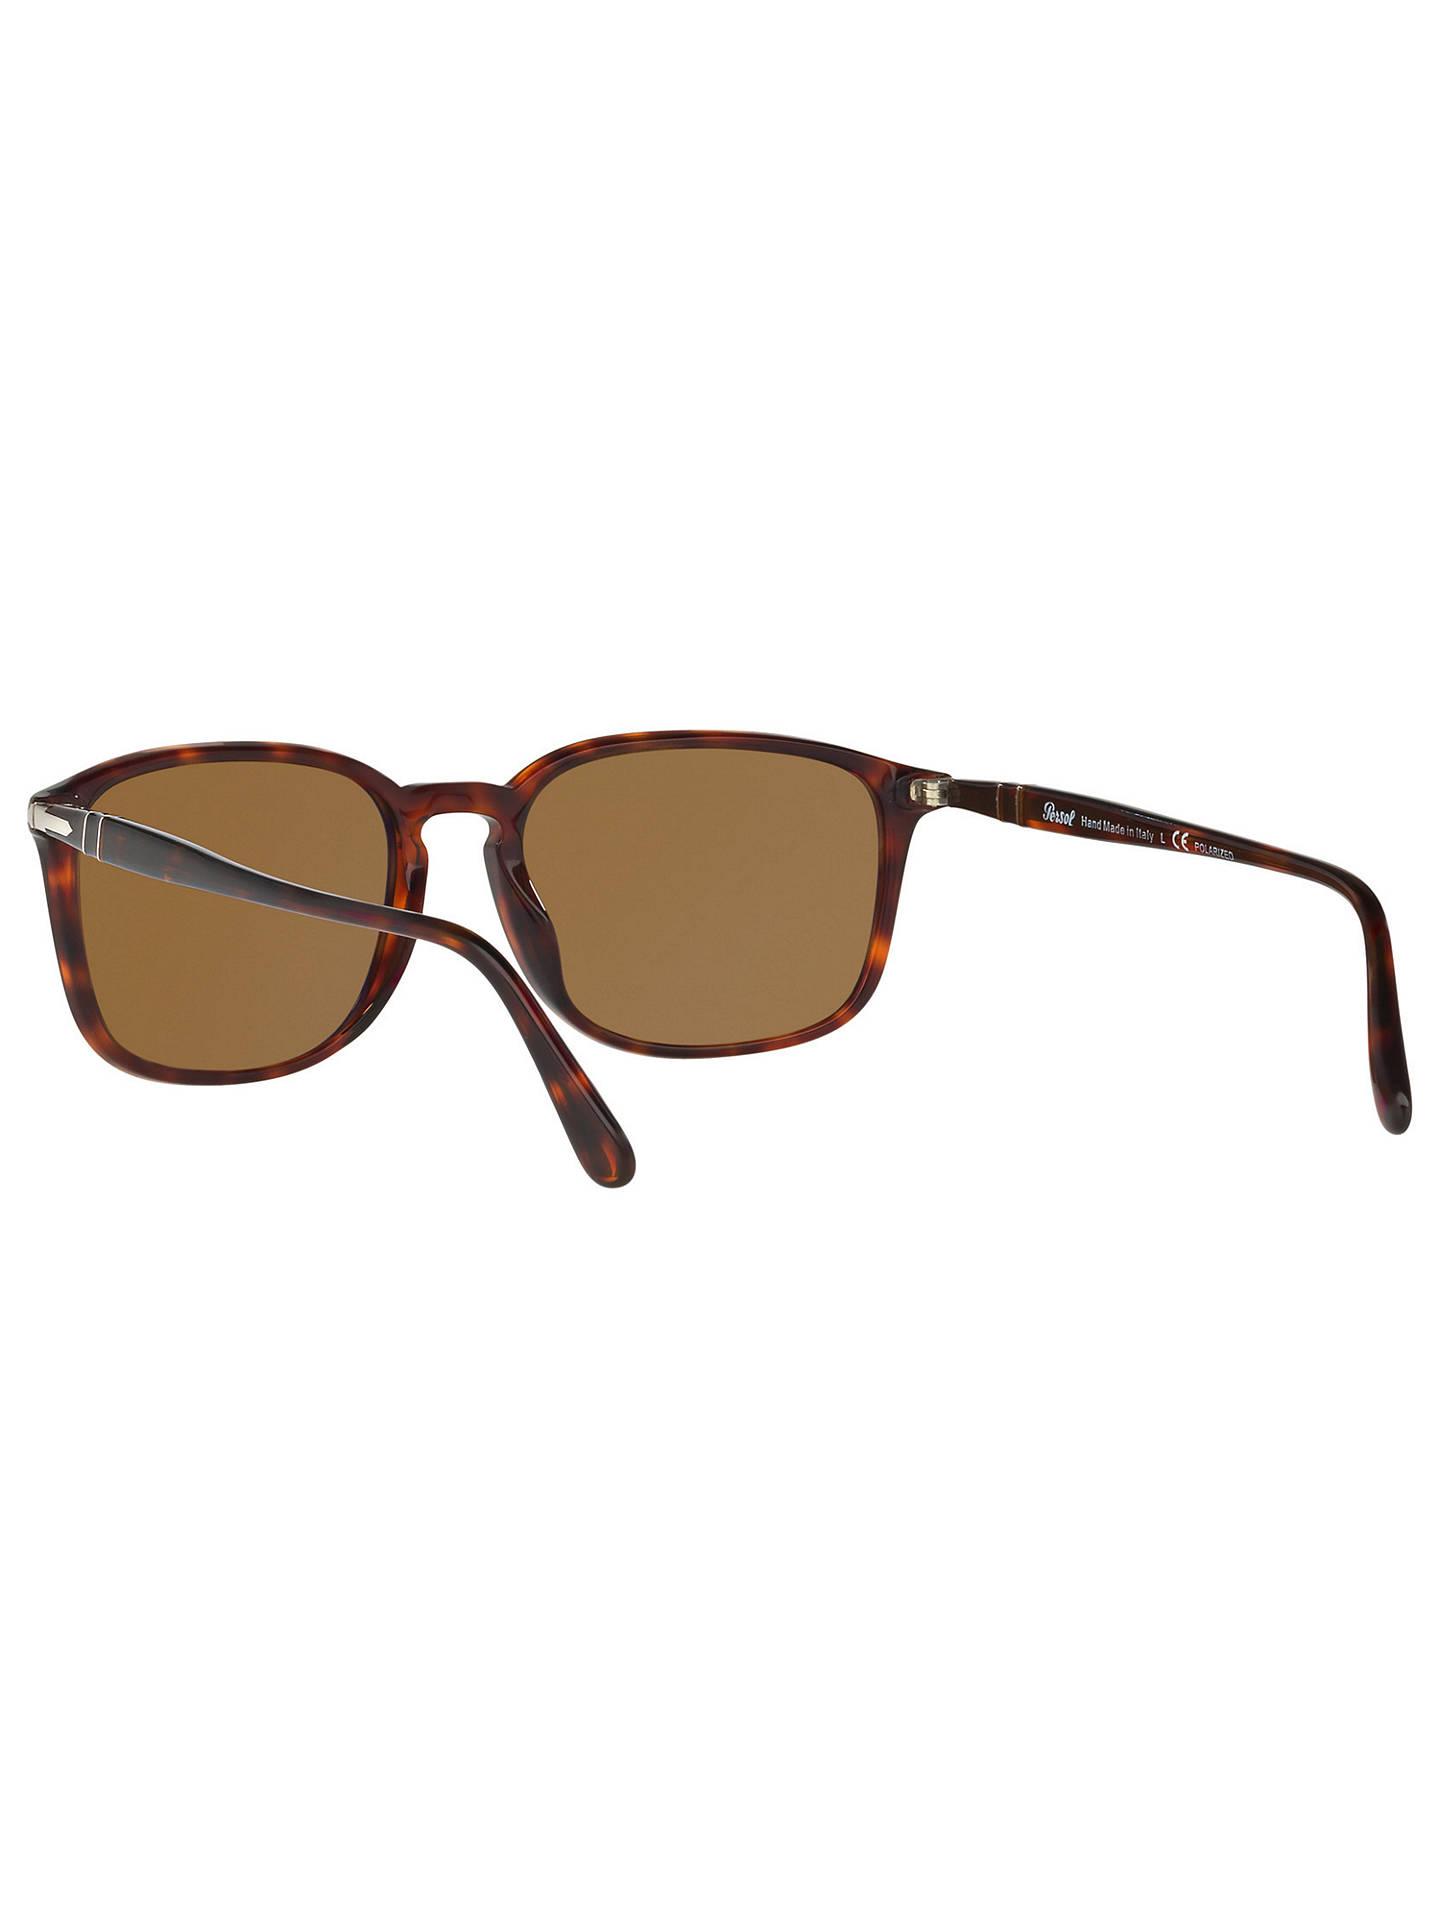 02ab8705f5b95 Persol PO3158S Polarised Square Sunglasses at John Lewis   Partners